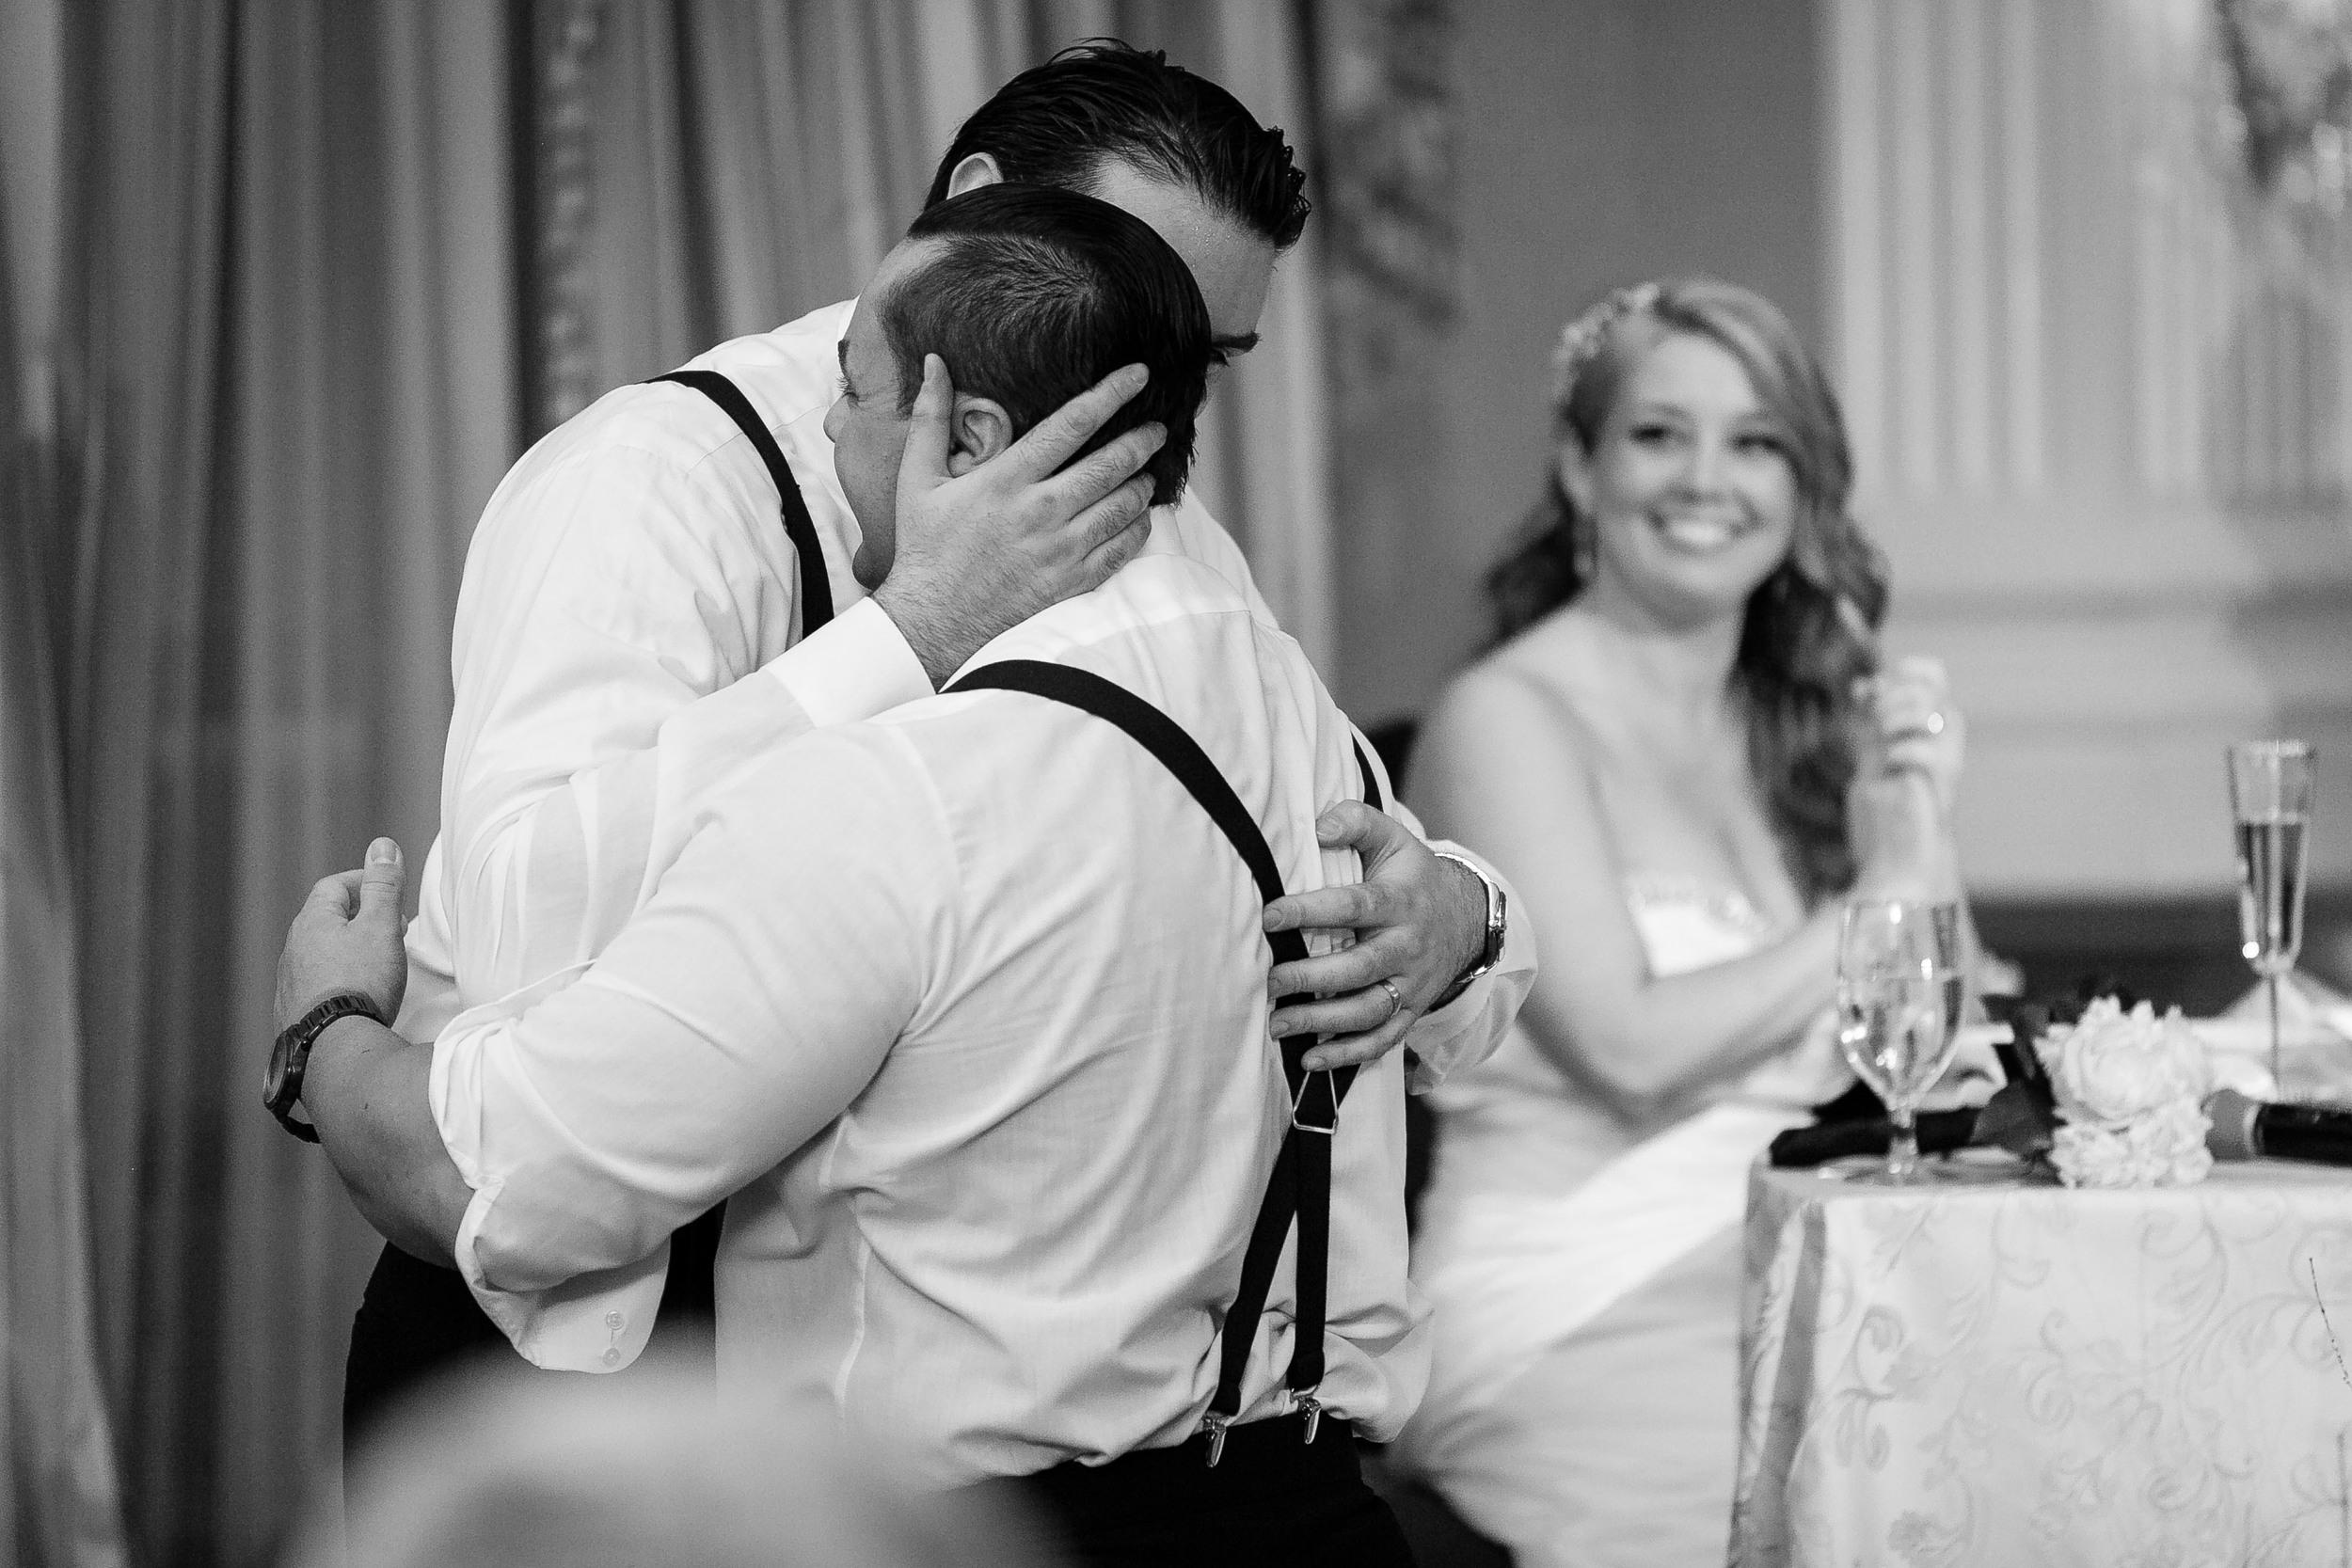 Russian-Jewish-Italian-Luxury-Wedding-The-Palace-at-Somerset-Park-NJ-Documentary-Wedding-Photography-11.jpg